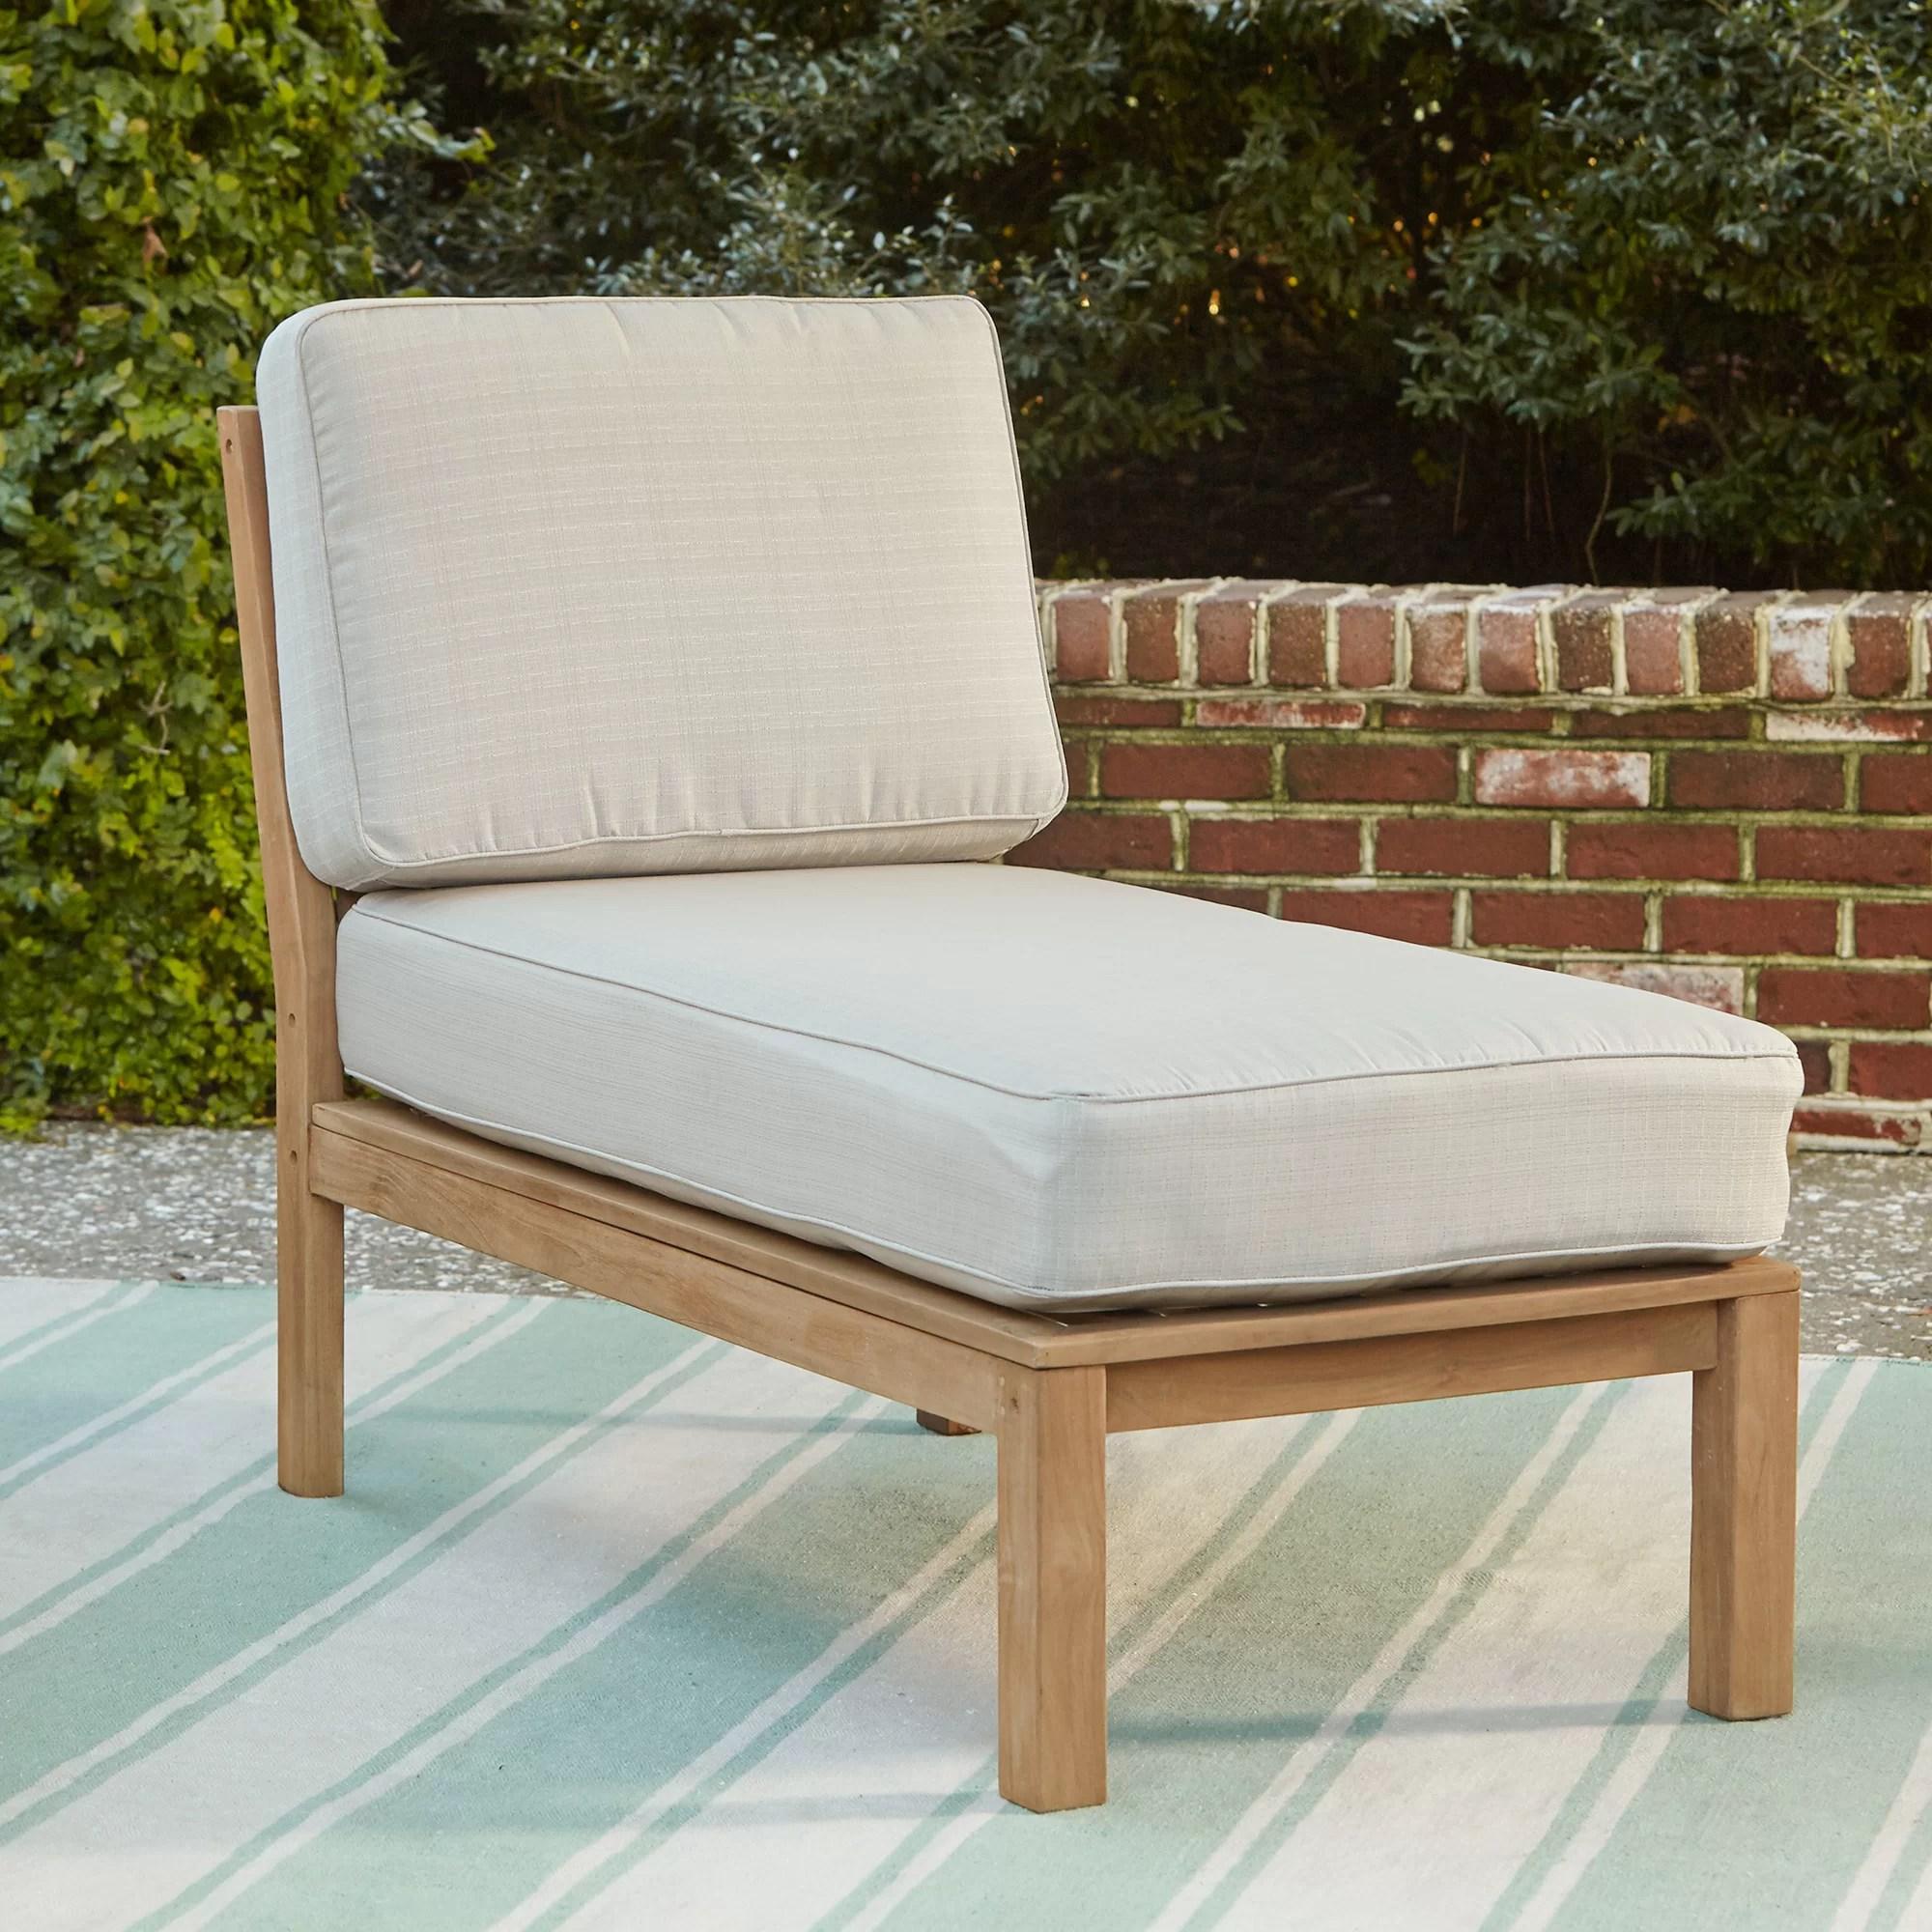 teak chaise lounge chairs sale used dinning summerton wayfair